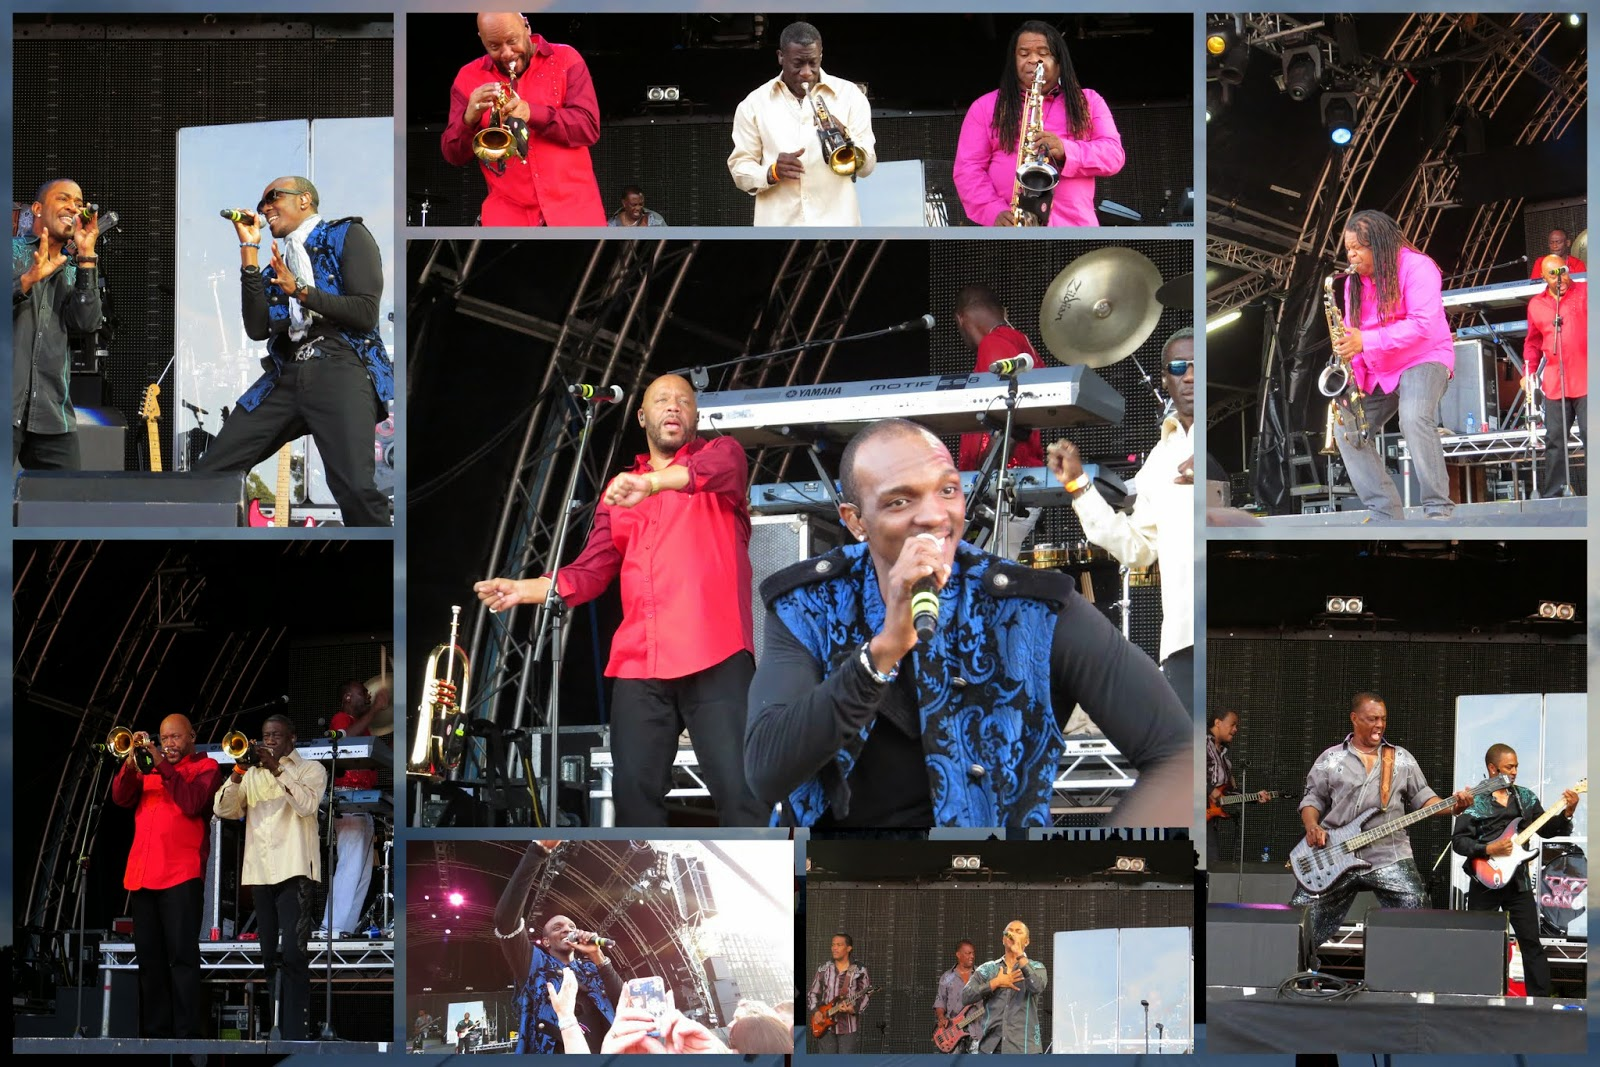 Westport Festival - Kool and the Gang